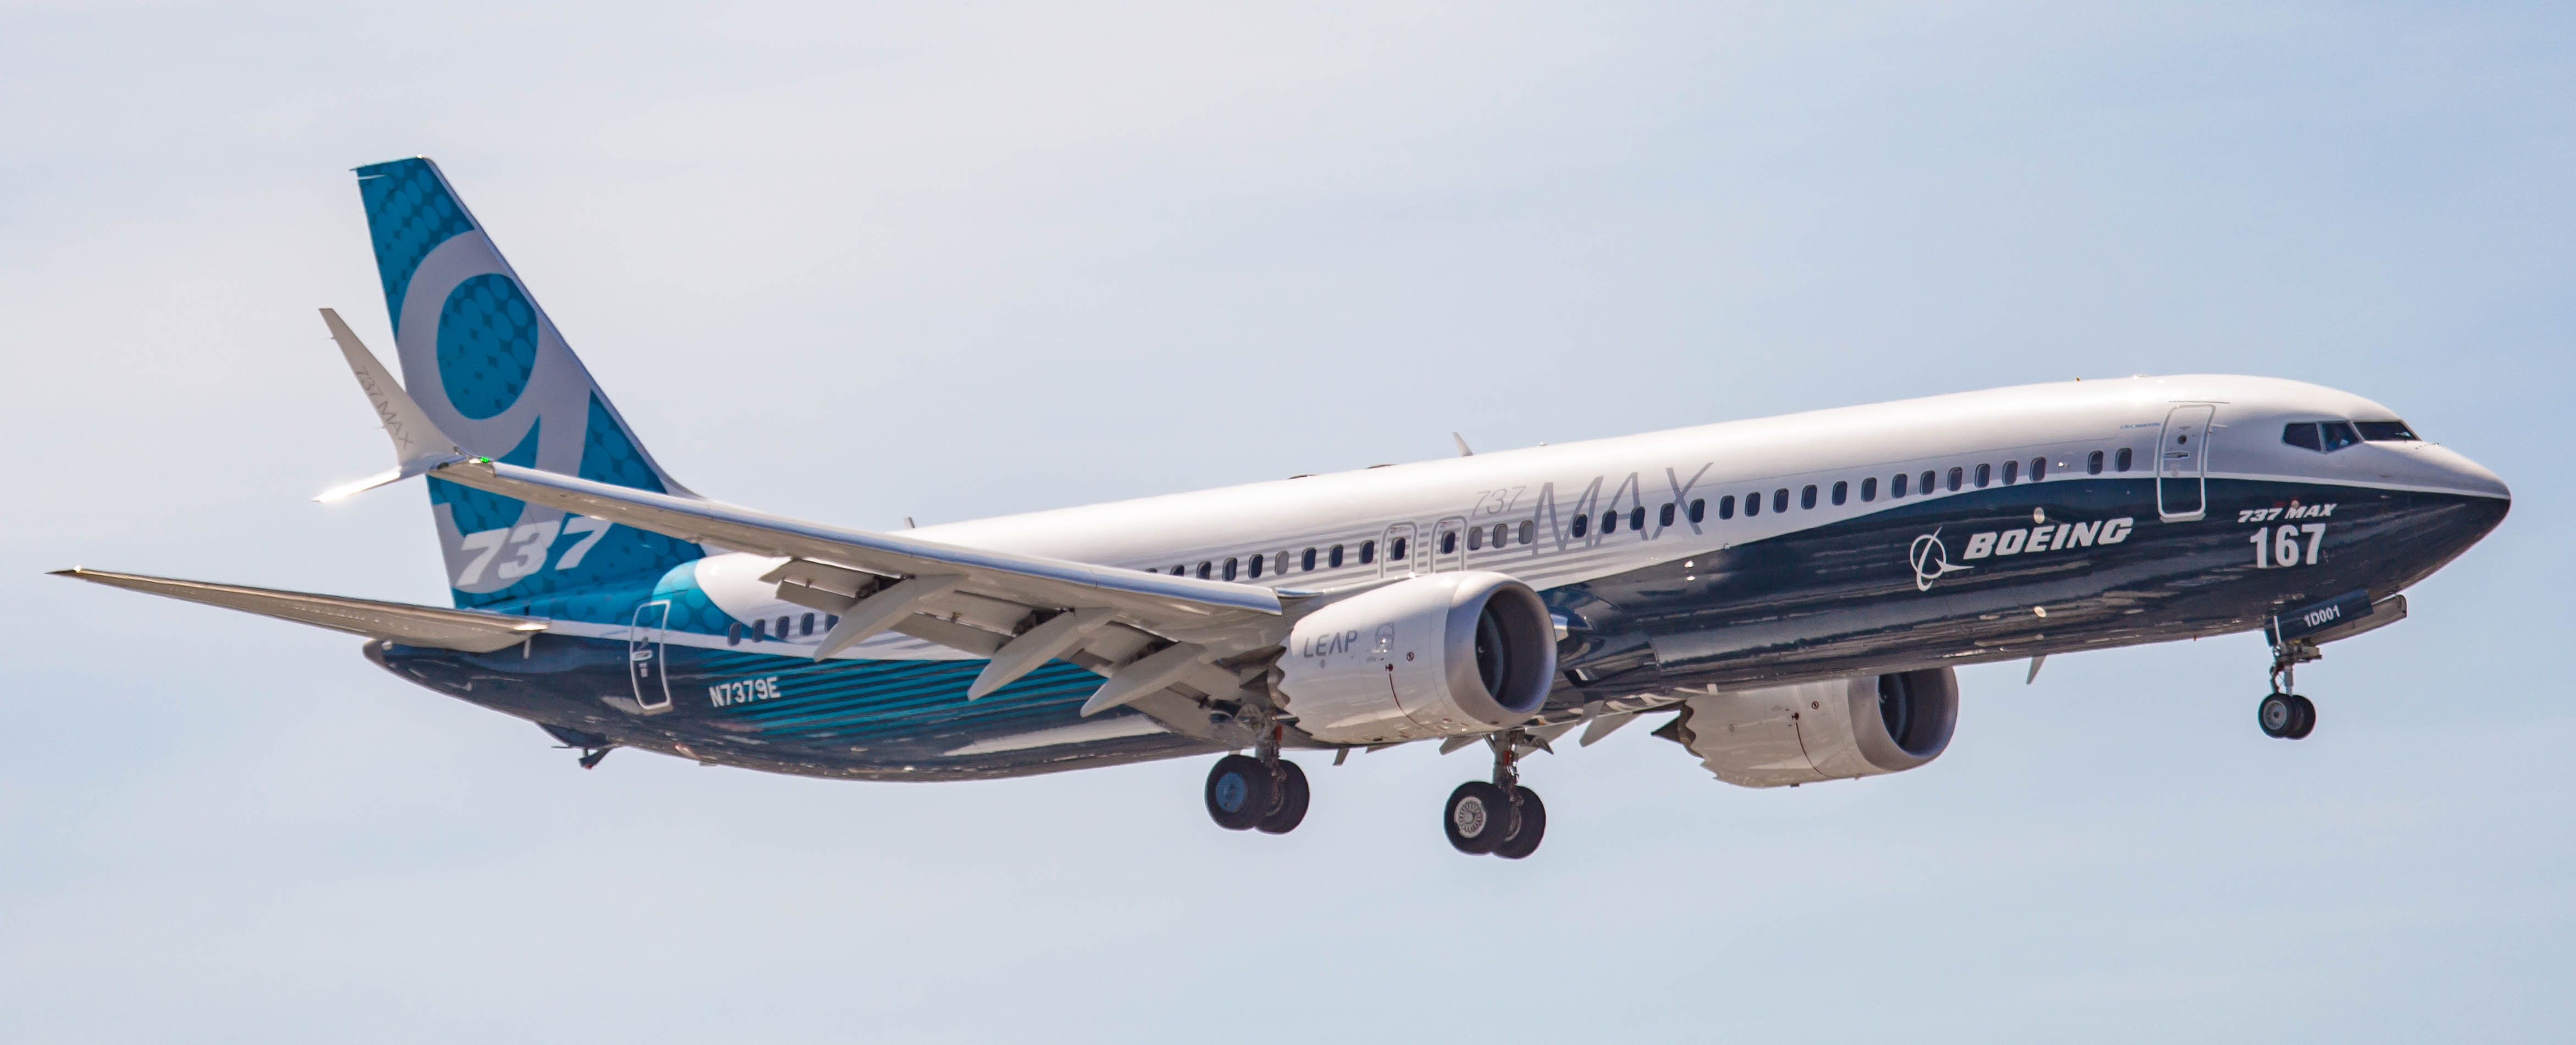 N7379E - Boeing 737 MAX 9.jpg